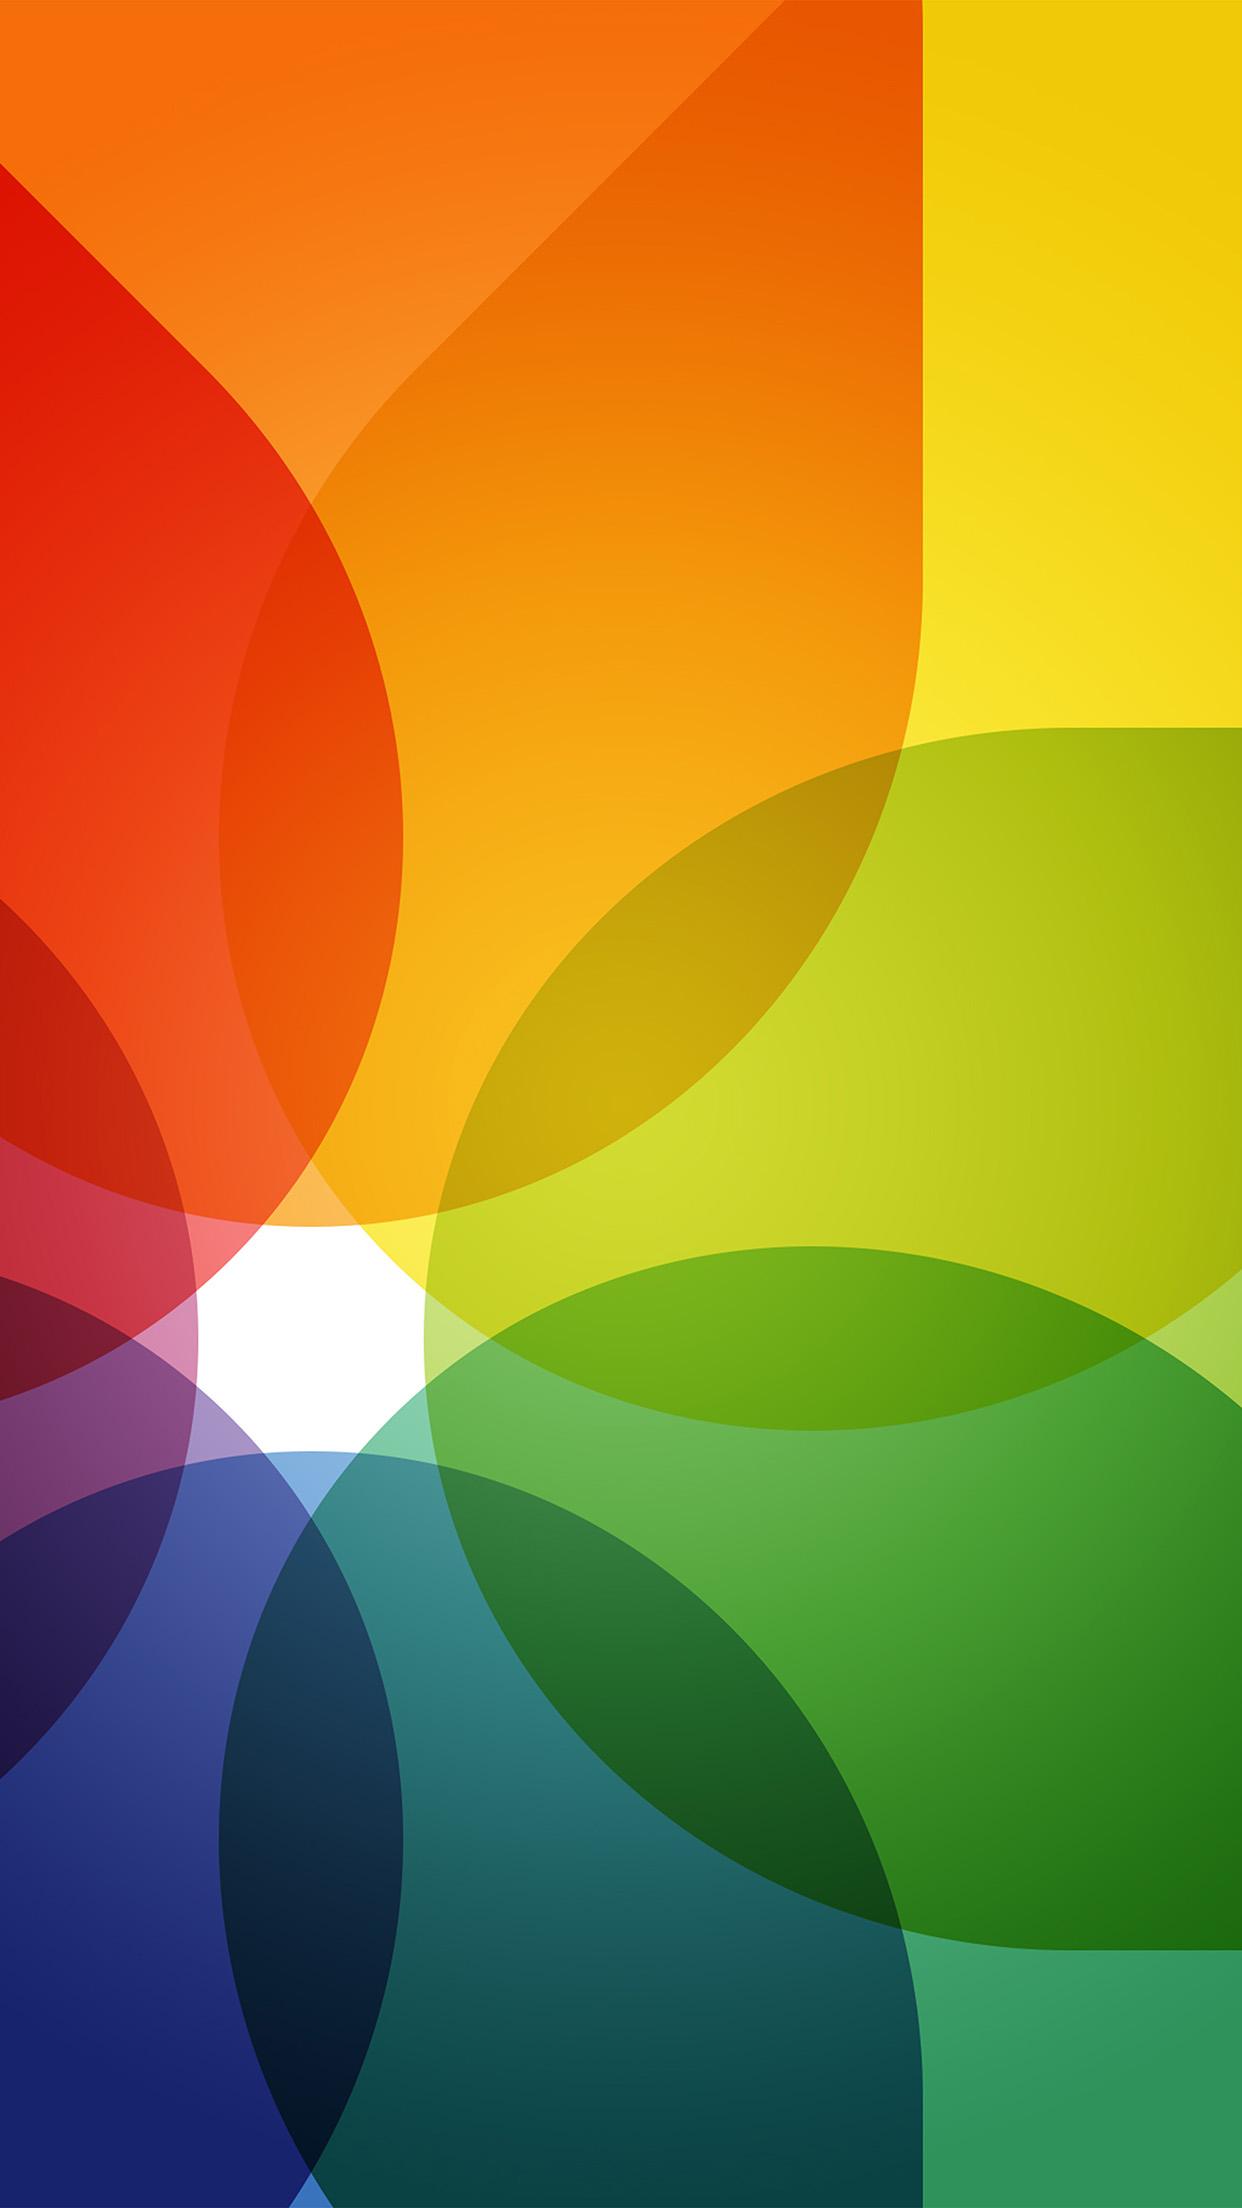 Iphone 6 Orange Flower Wallpaper For Iphone X Iphonexpapers